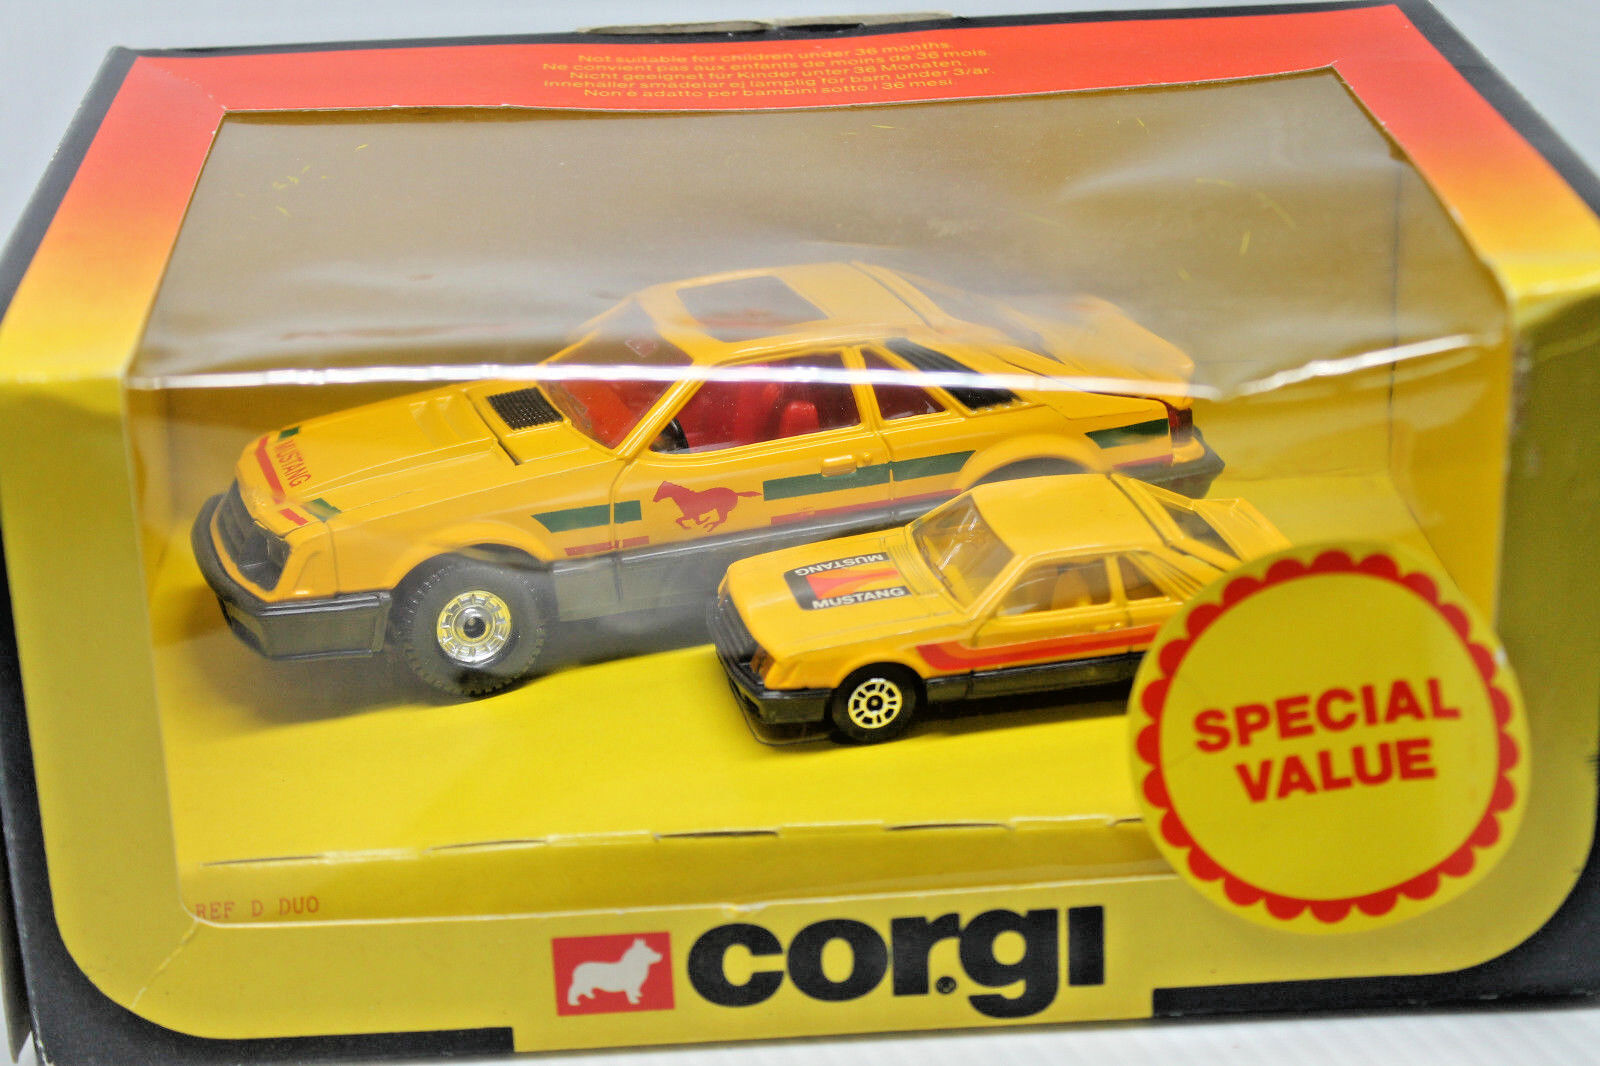 CORGI TOYS  FORD MUSTANG  Large & Little  OVP  1981